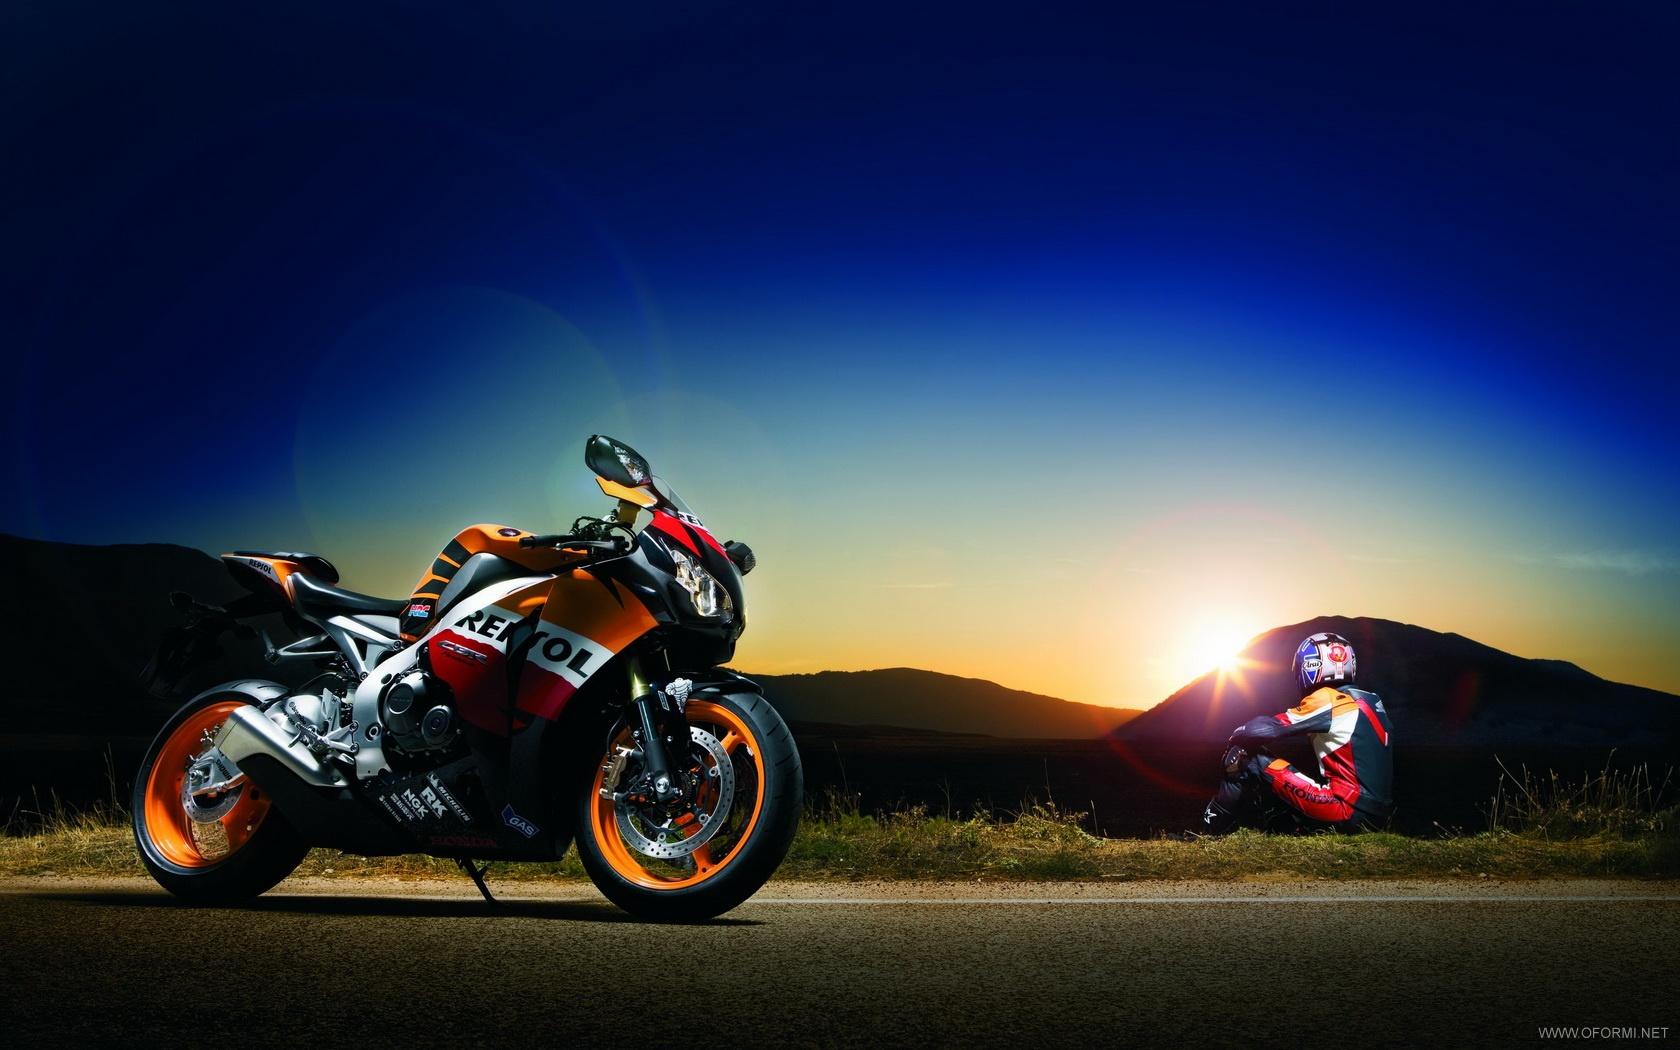 Pin Honda Cbr1000rr » Мотоциклы Обои для on Pinterest